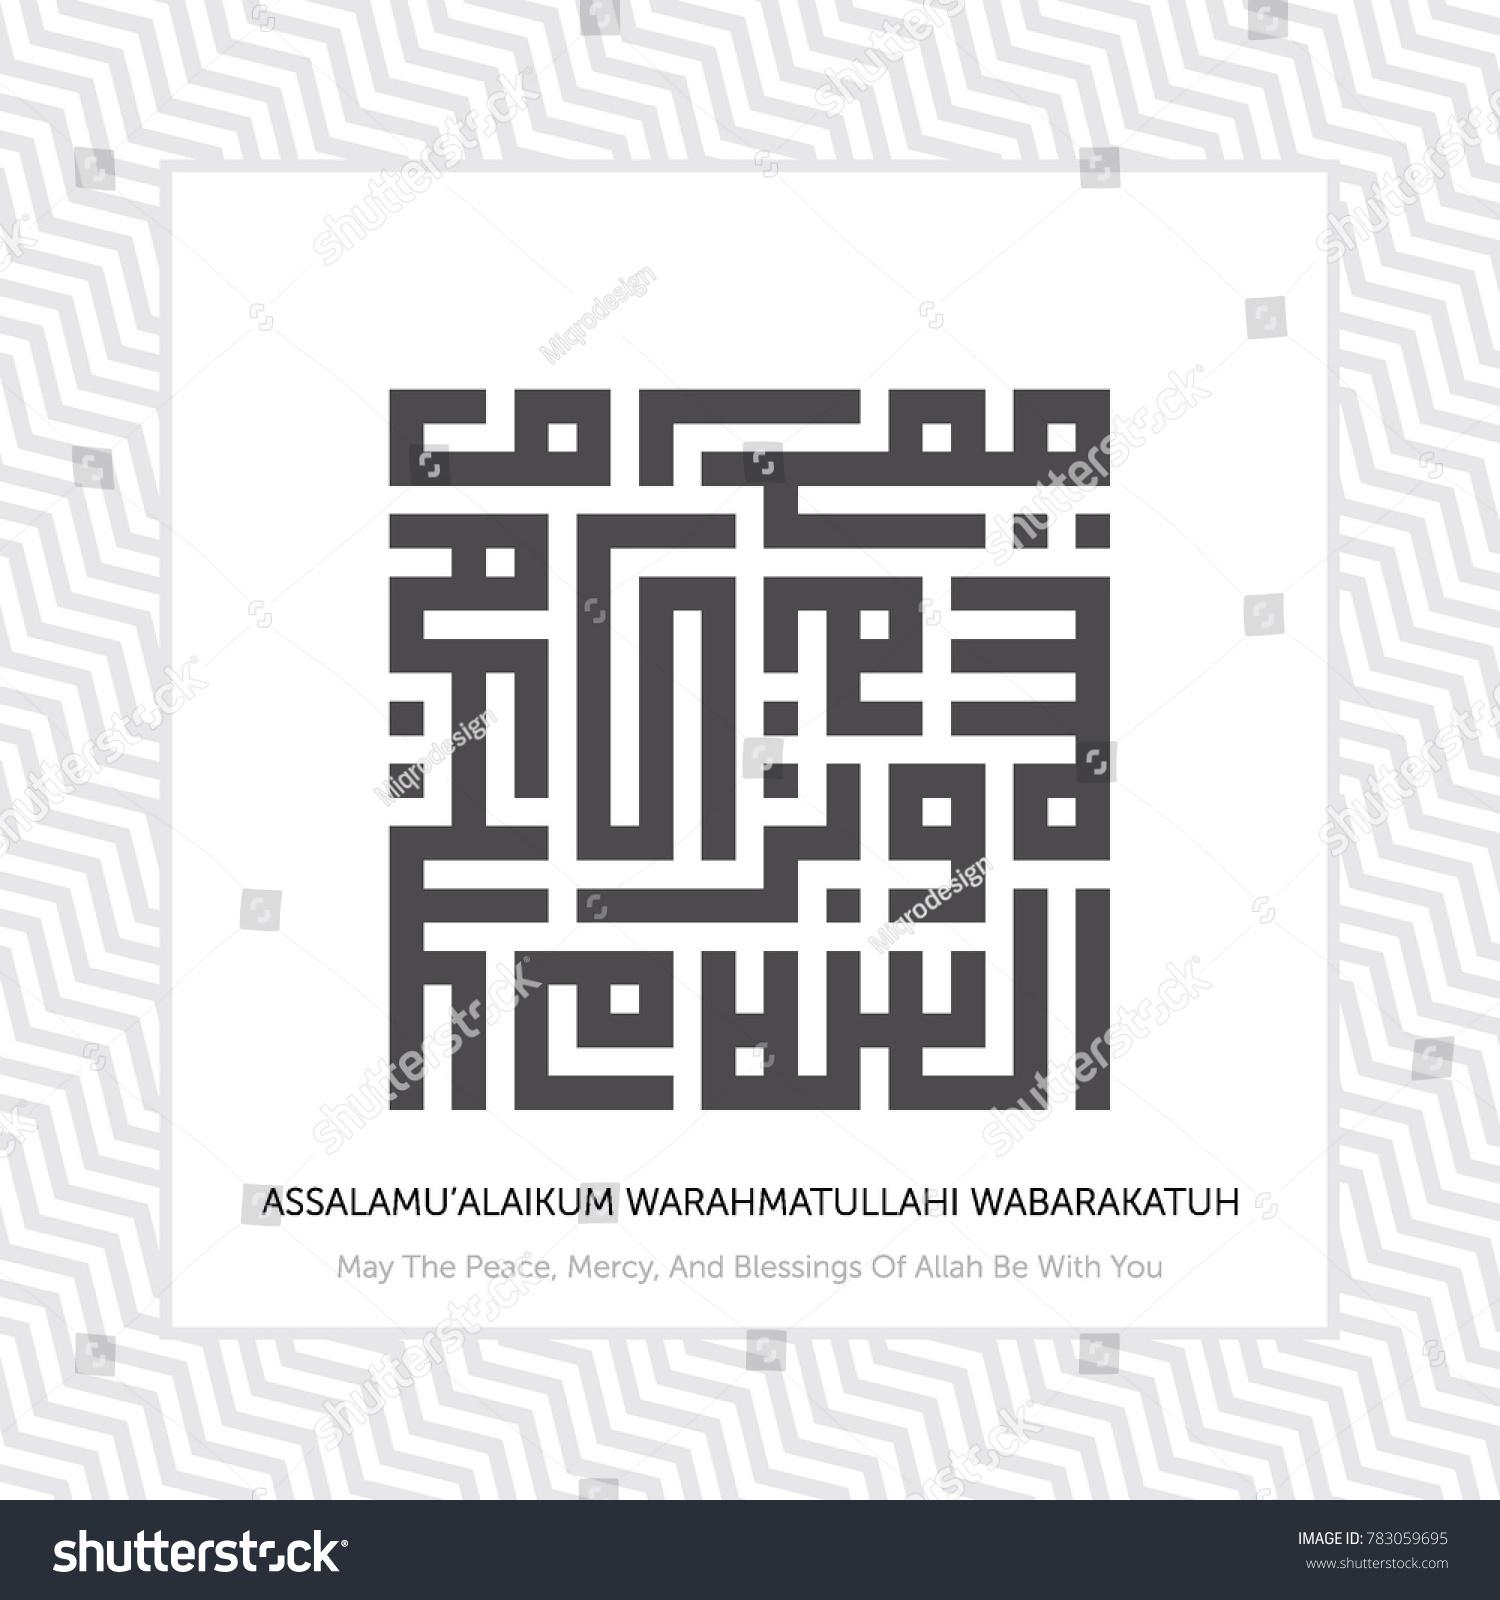 Kaligrafi Assalamualaikum Vector